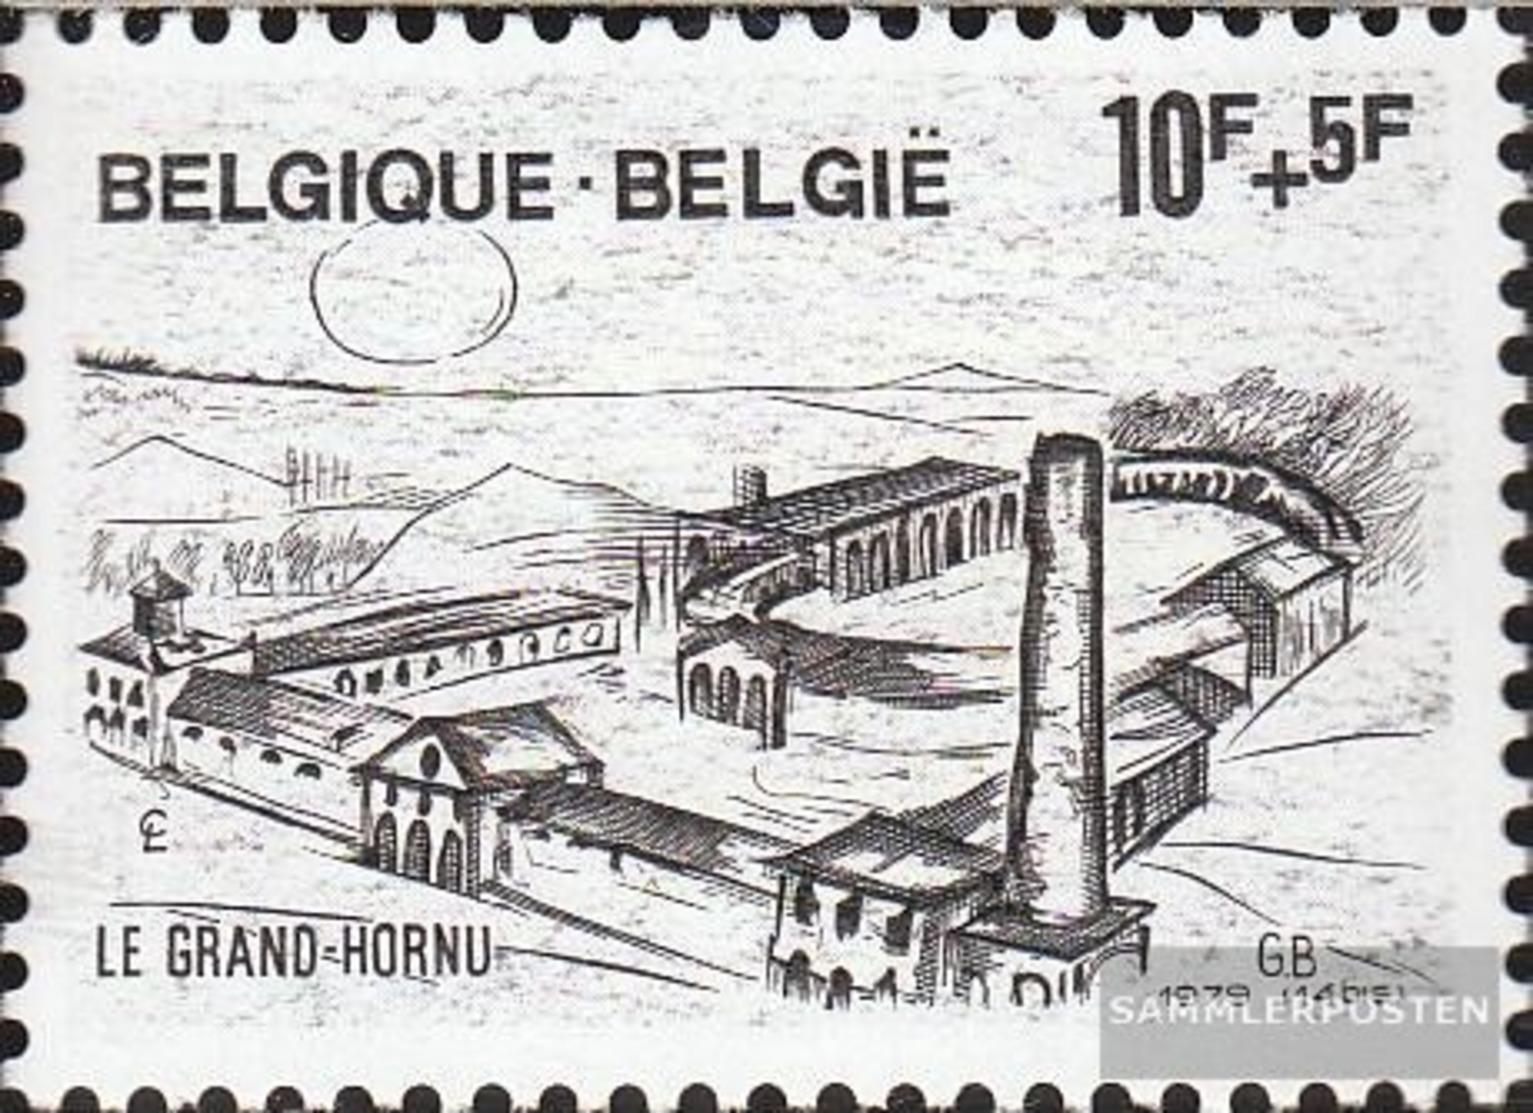 Belgien 2002 (completa Edizione) MNH 1979 Le Grand-Hornu - Nuevos